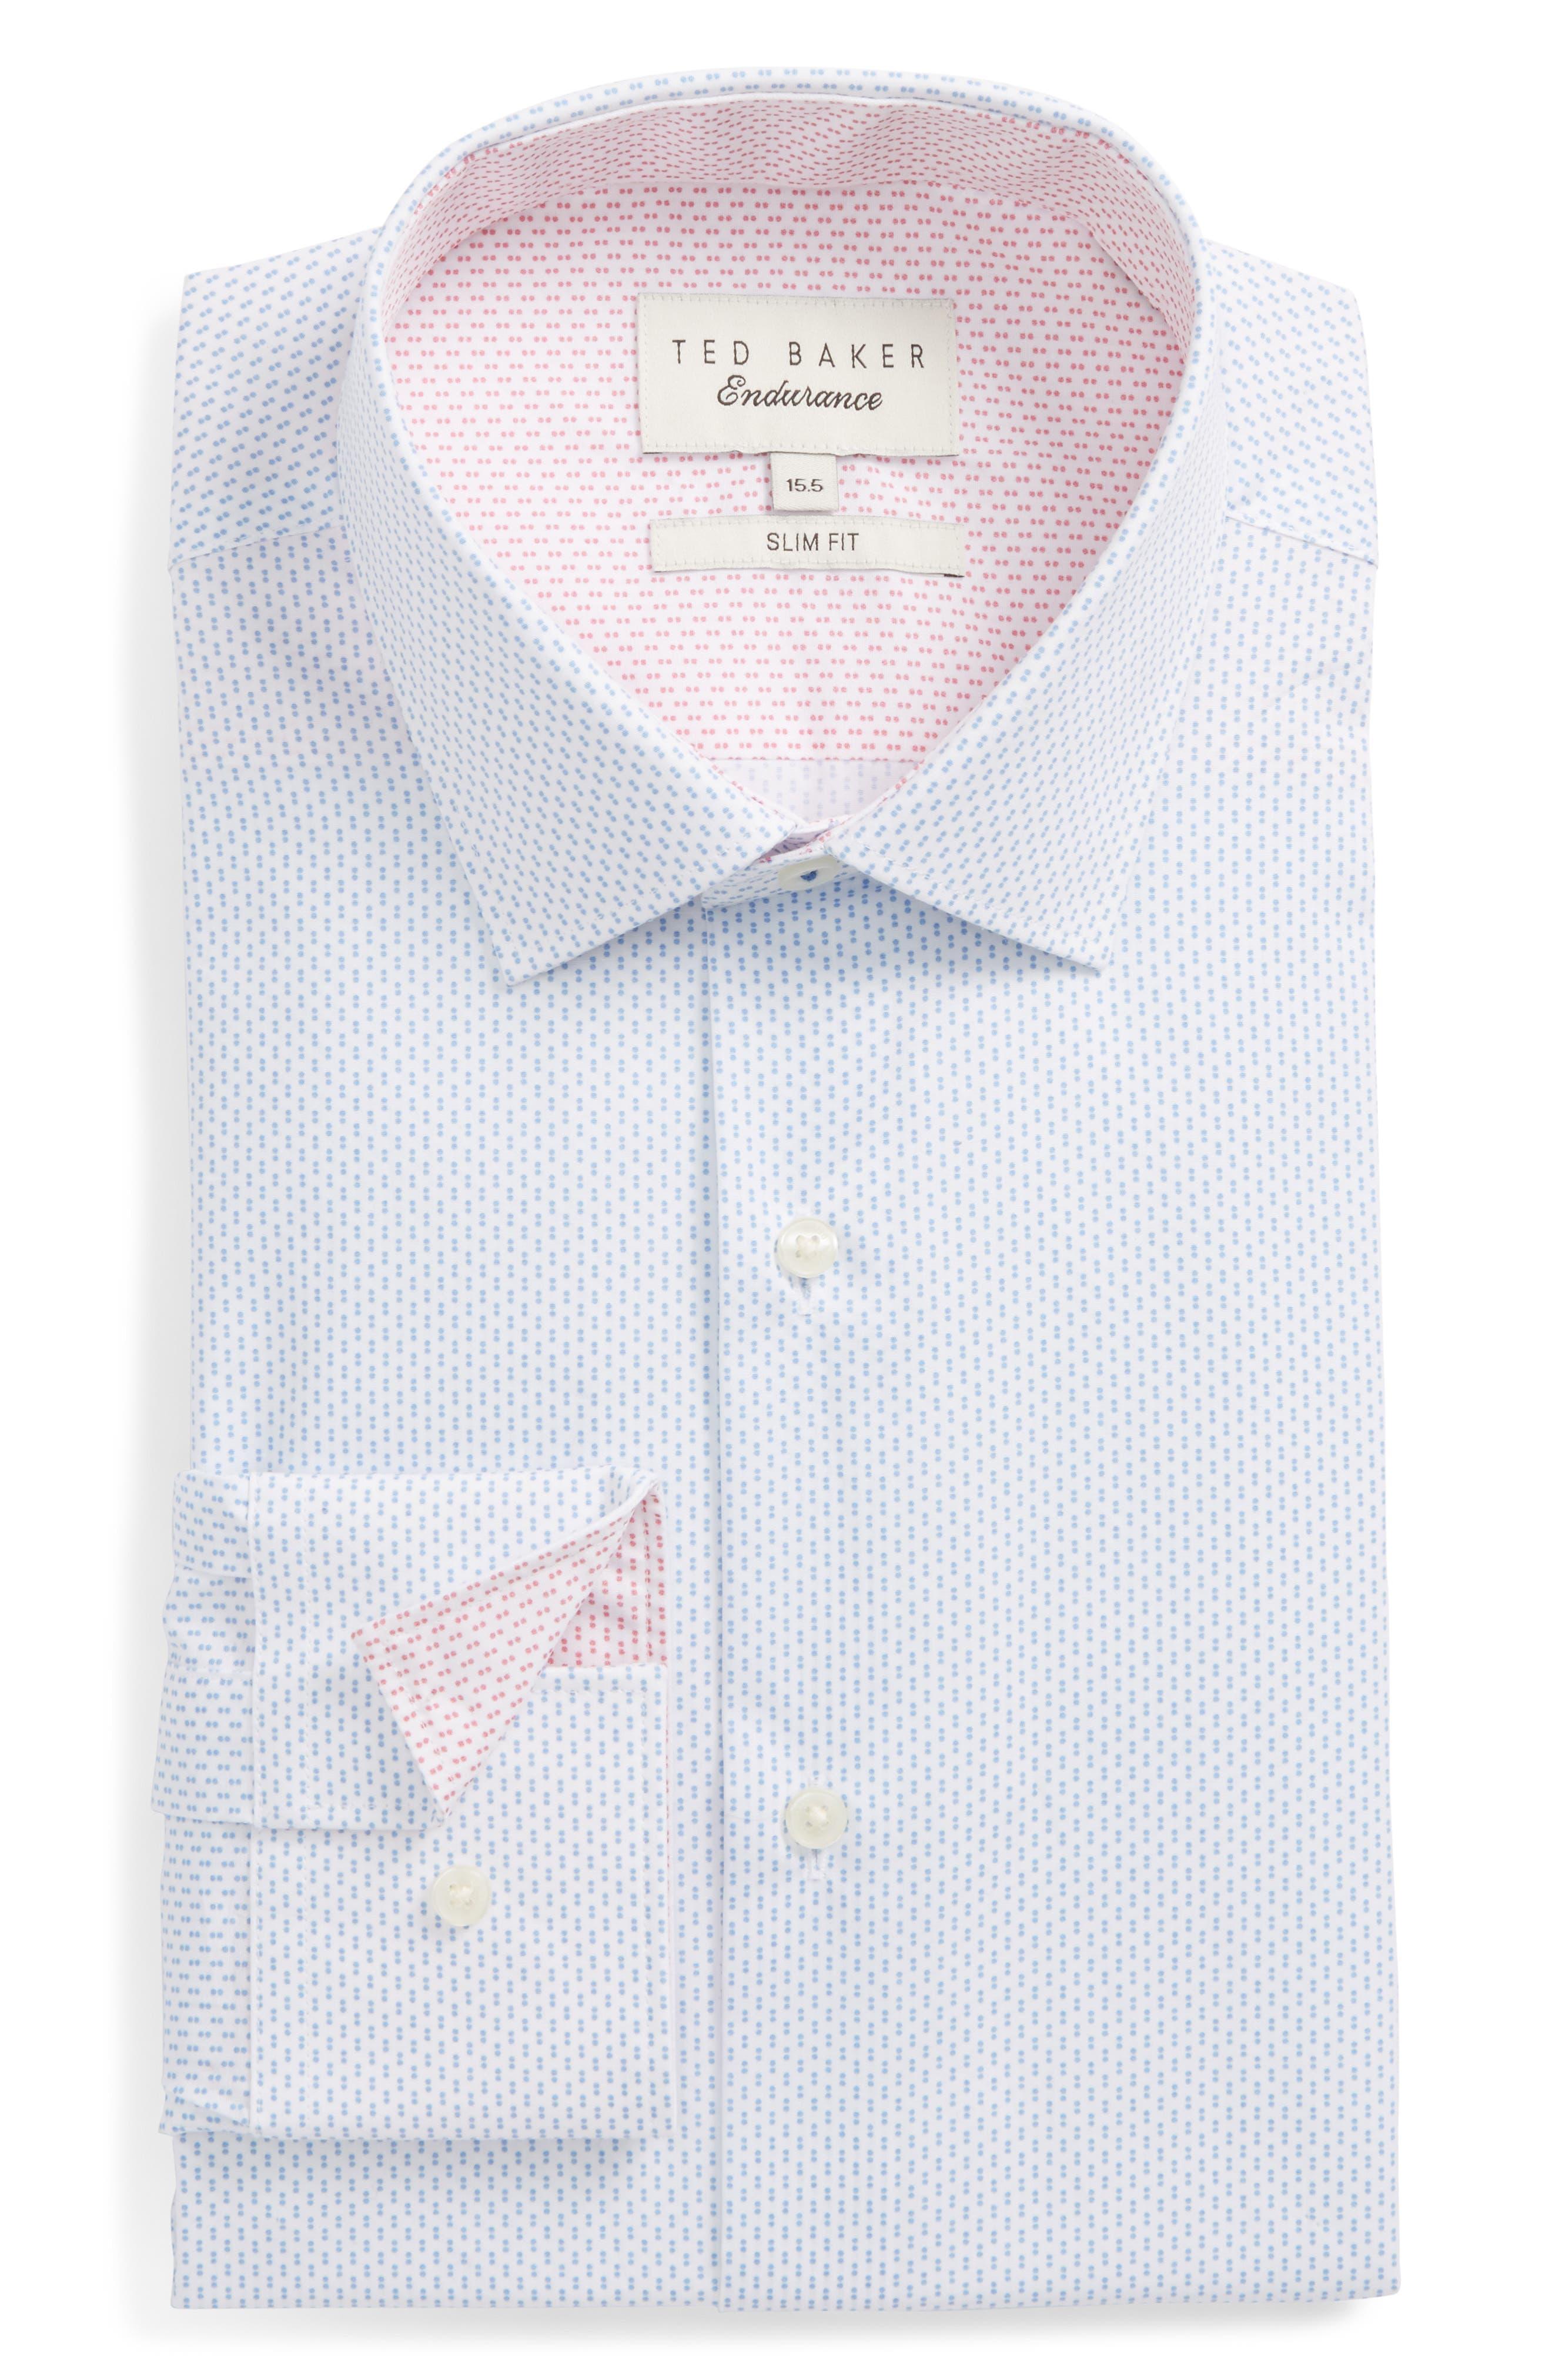 Ted Baker London Endurance Barged Slim Fit Double Dot Dress Shirt